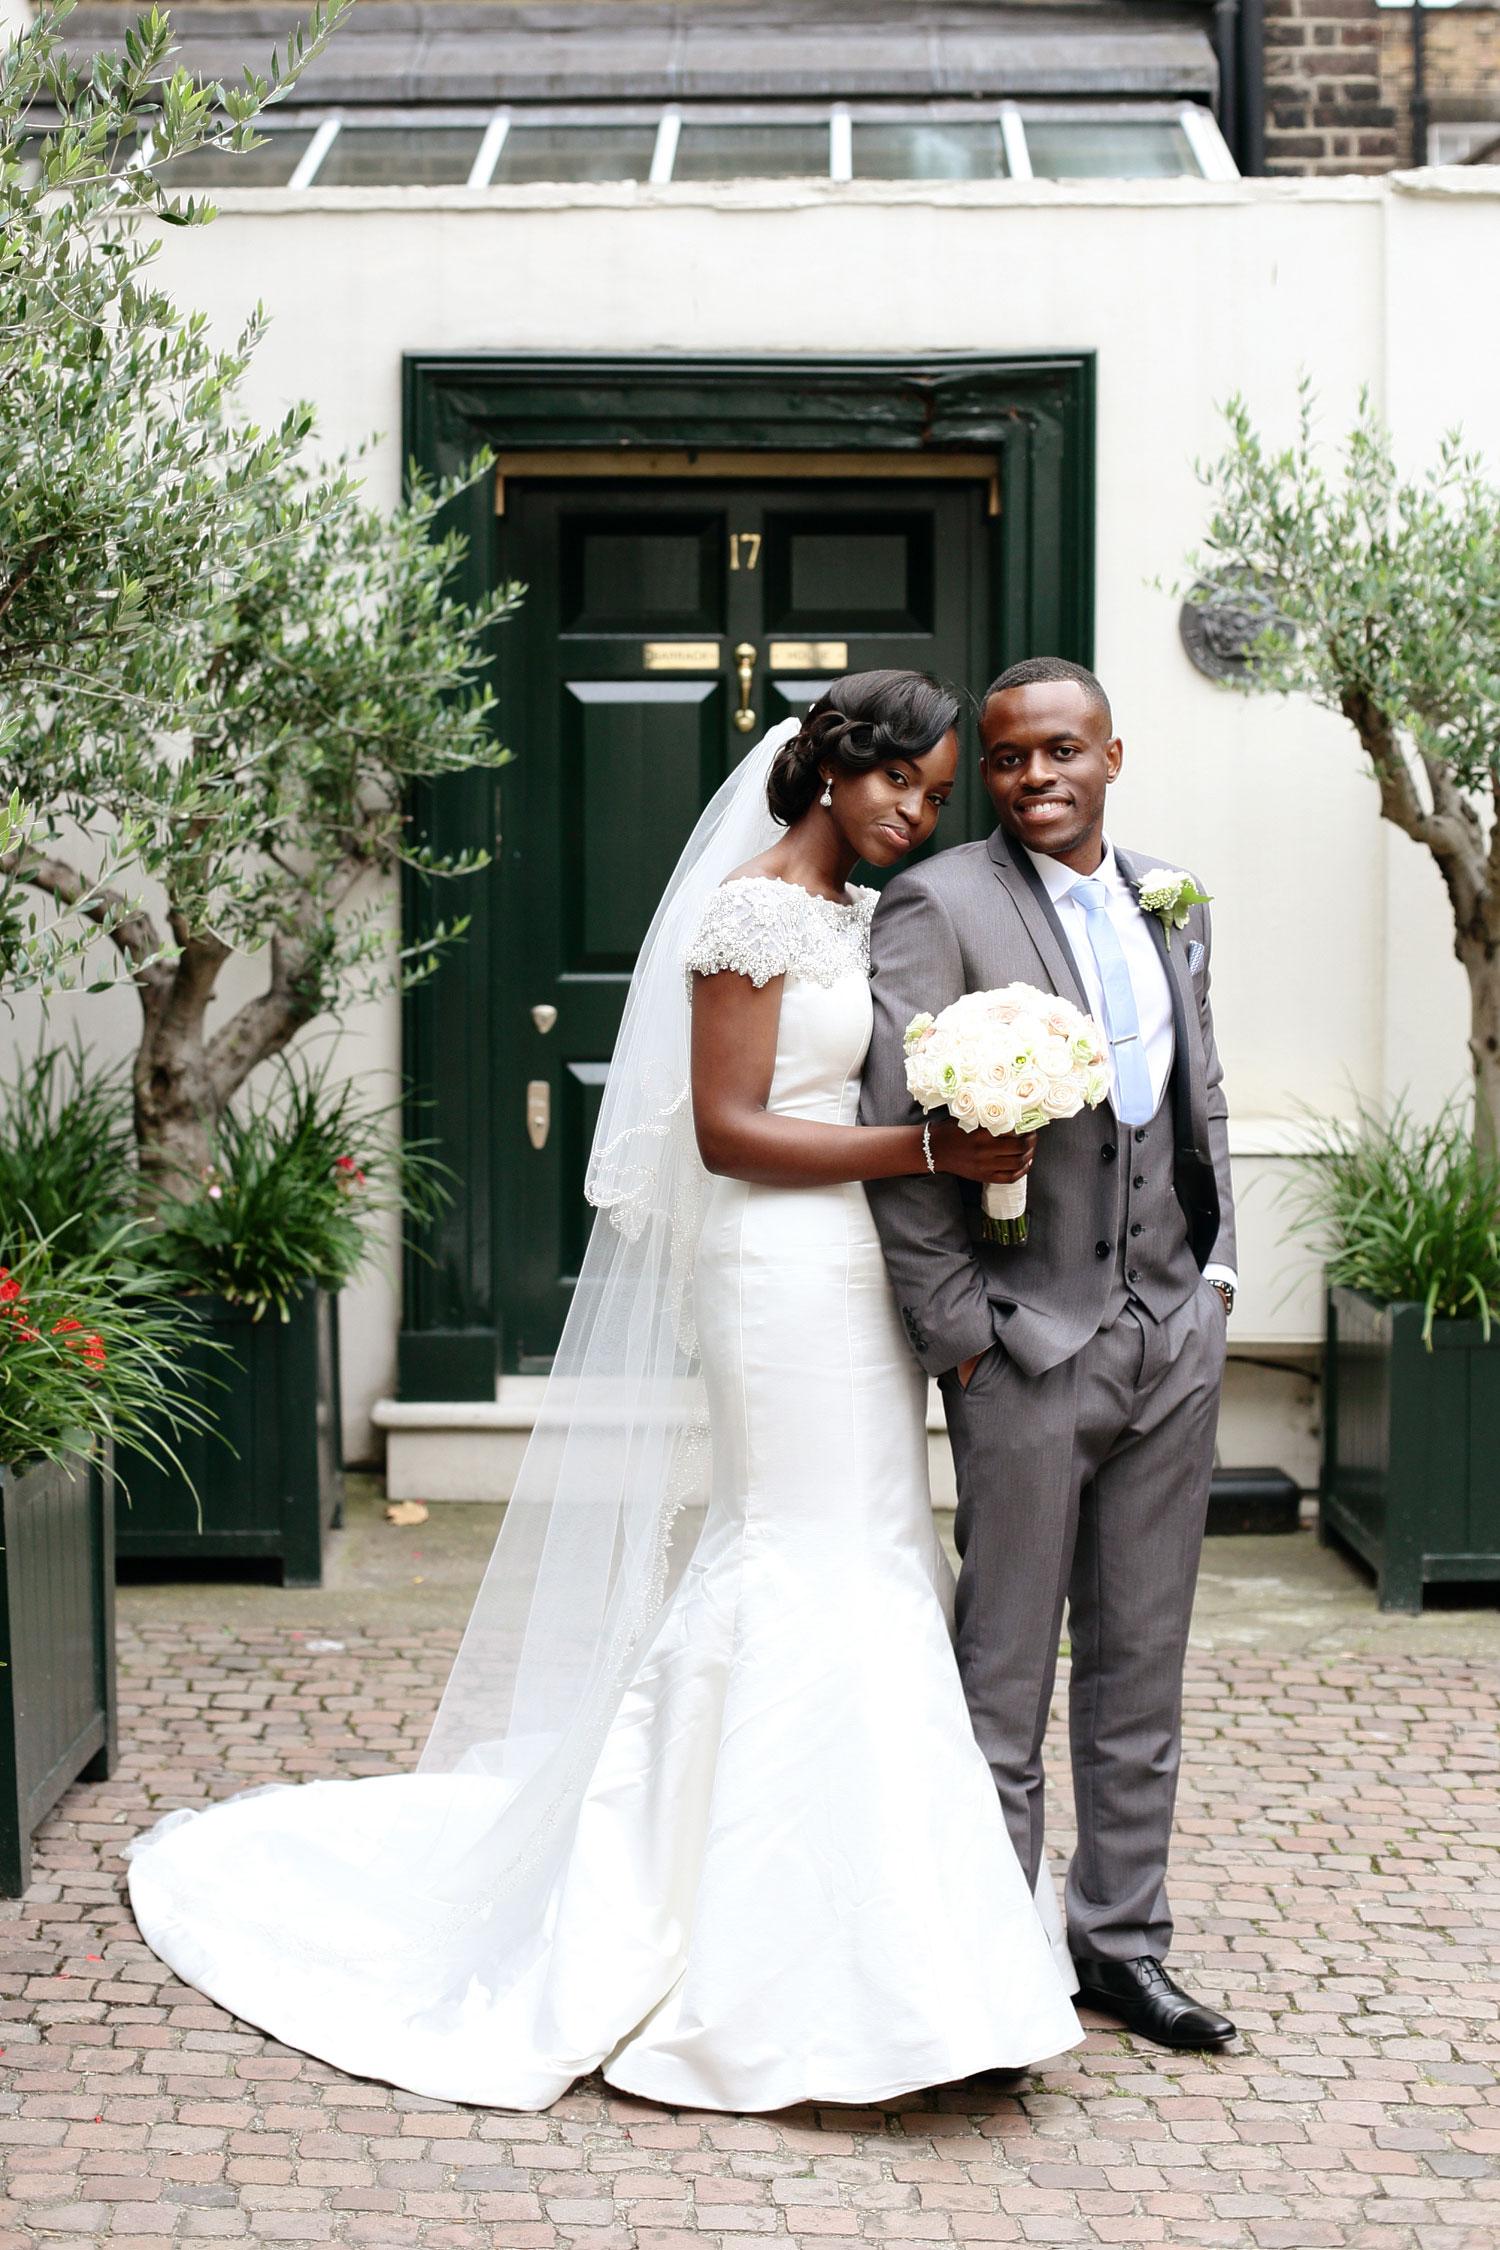 The Berkeley Hotel luxury wedding venue in London